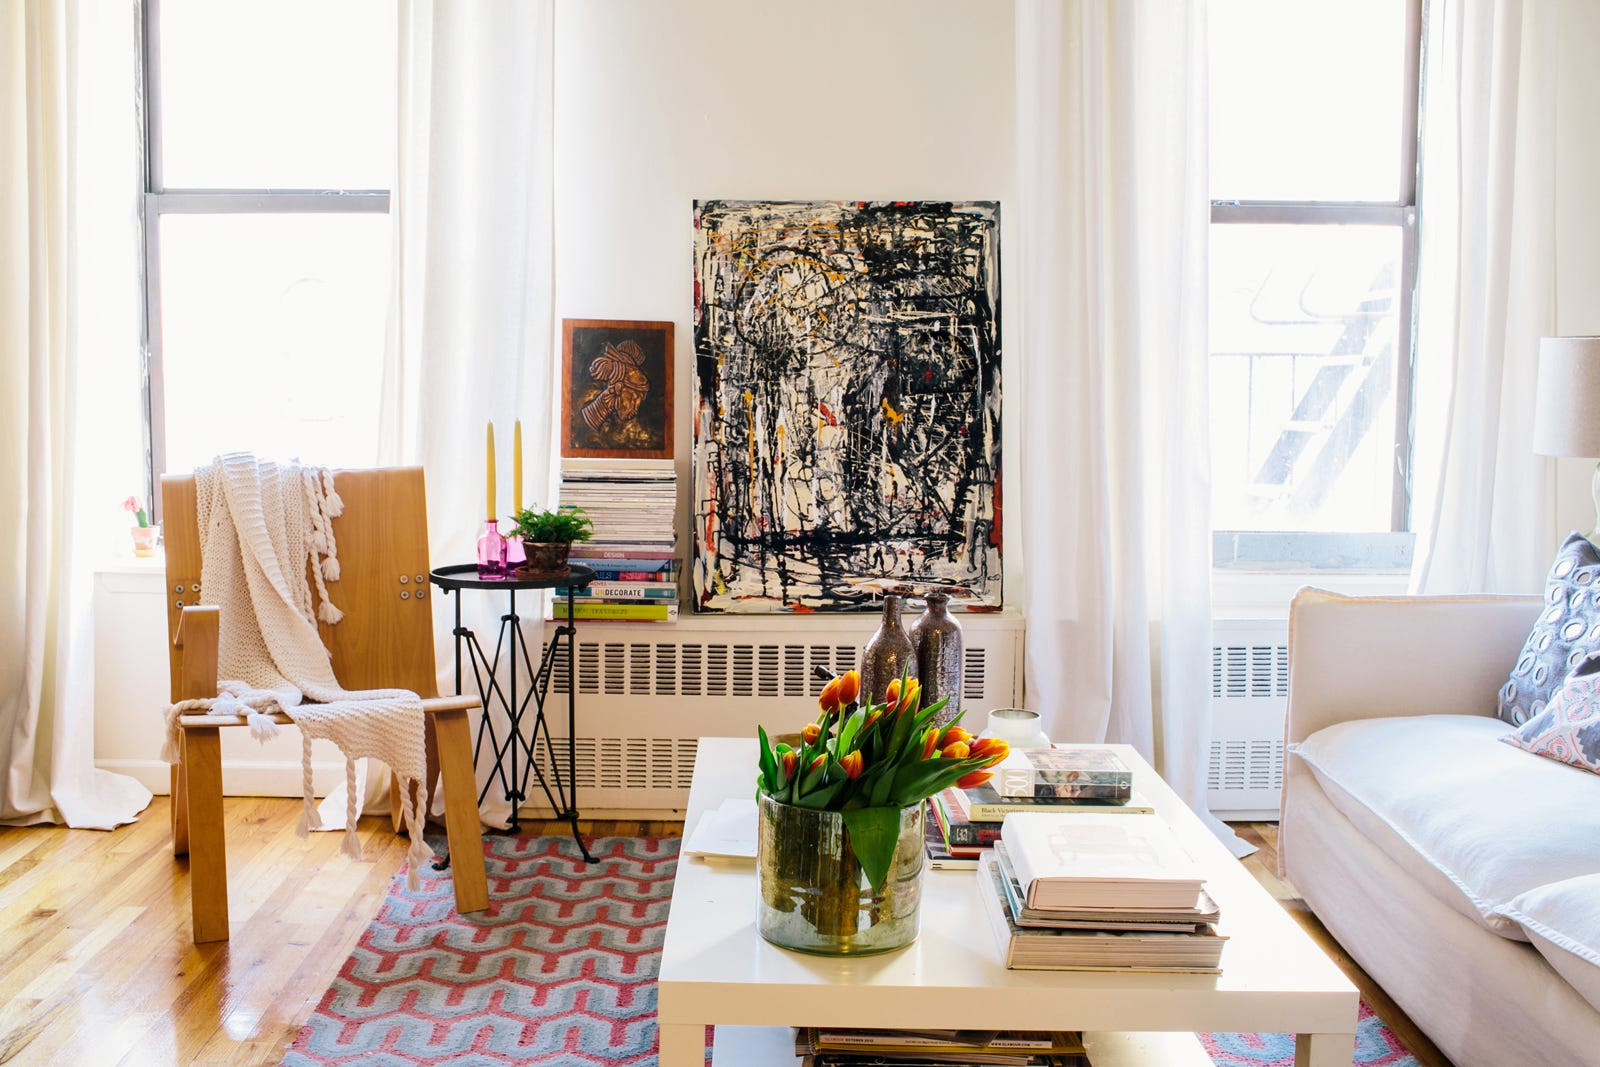 NYC Apartments - Decorating Small Apartments